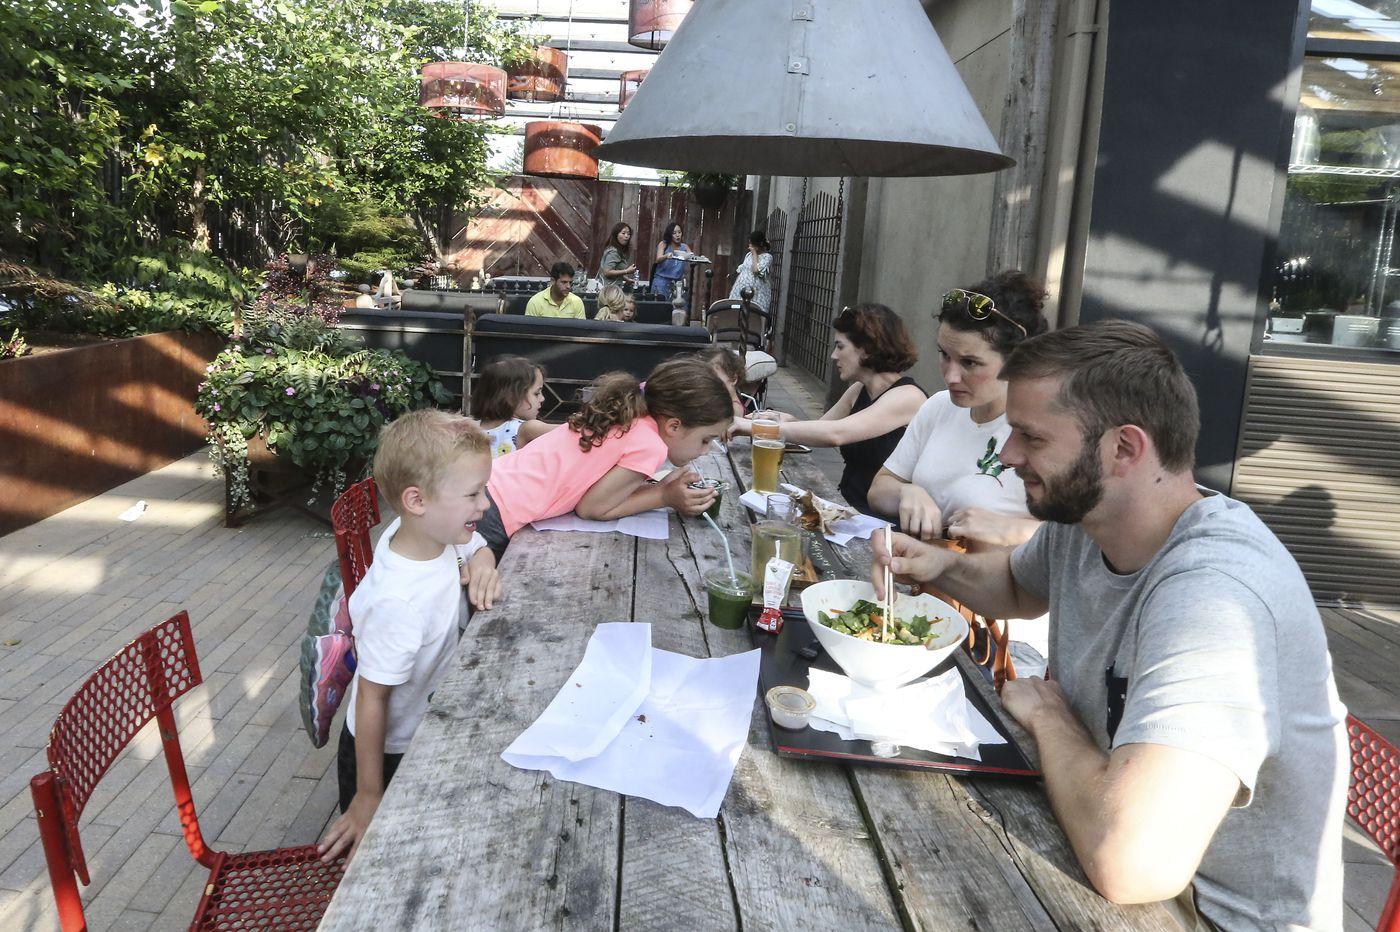 In Chestnut Hill, residents sue family-friendly beer garden